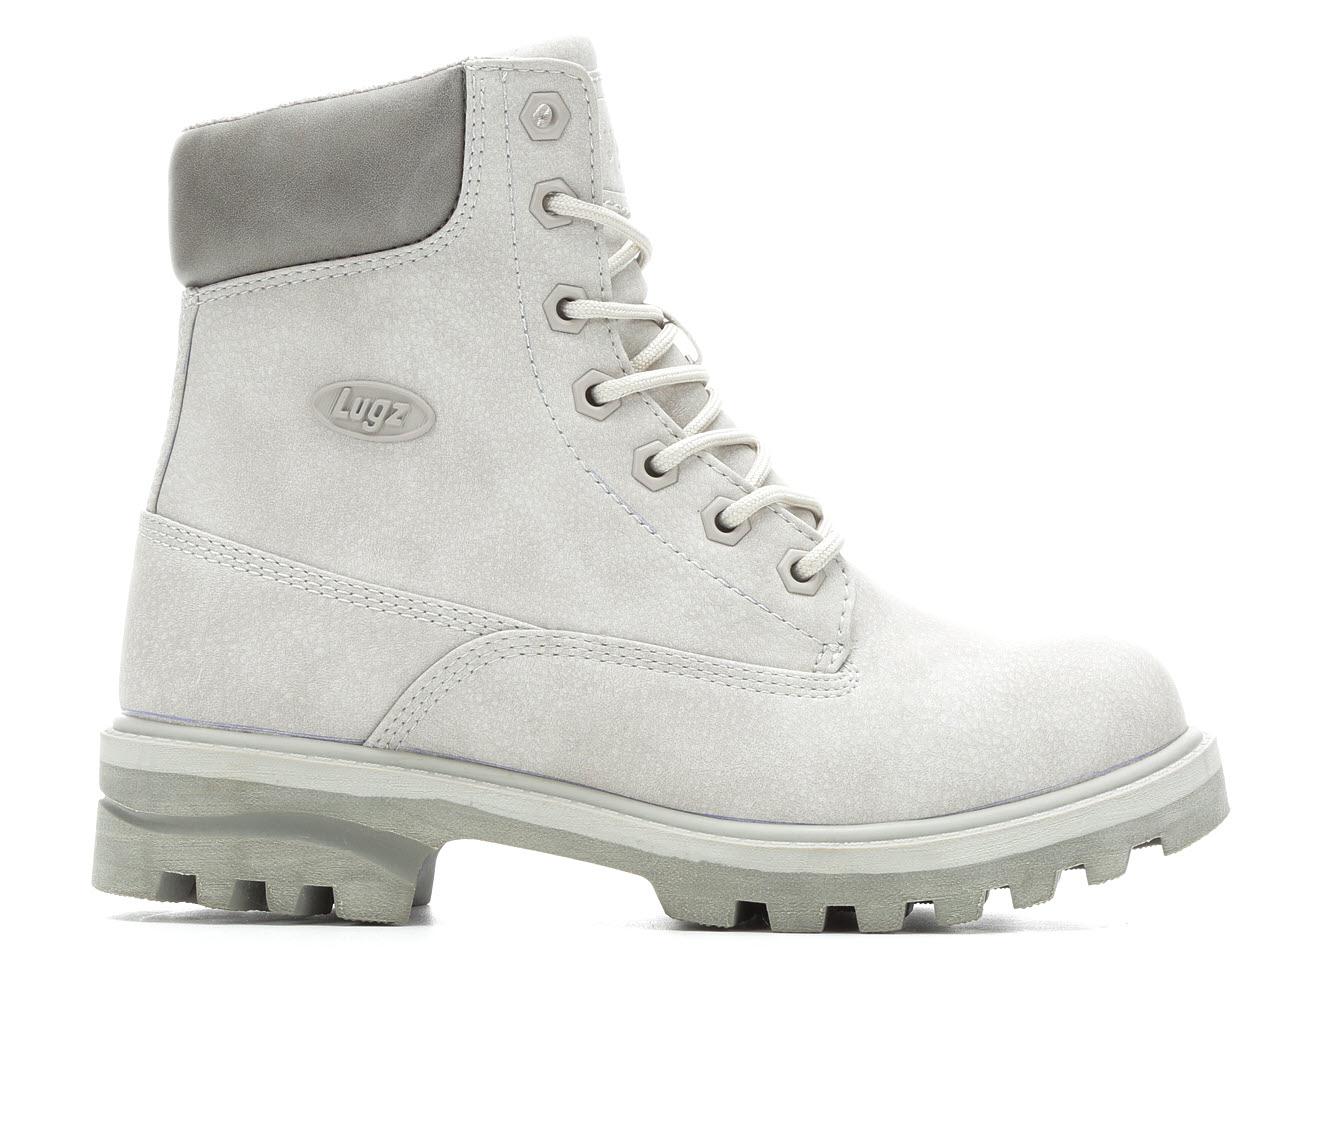 Lugz Empire Hi Women's Boot (Gray Faux Leather)